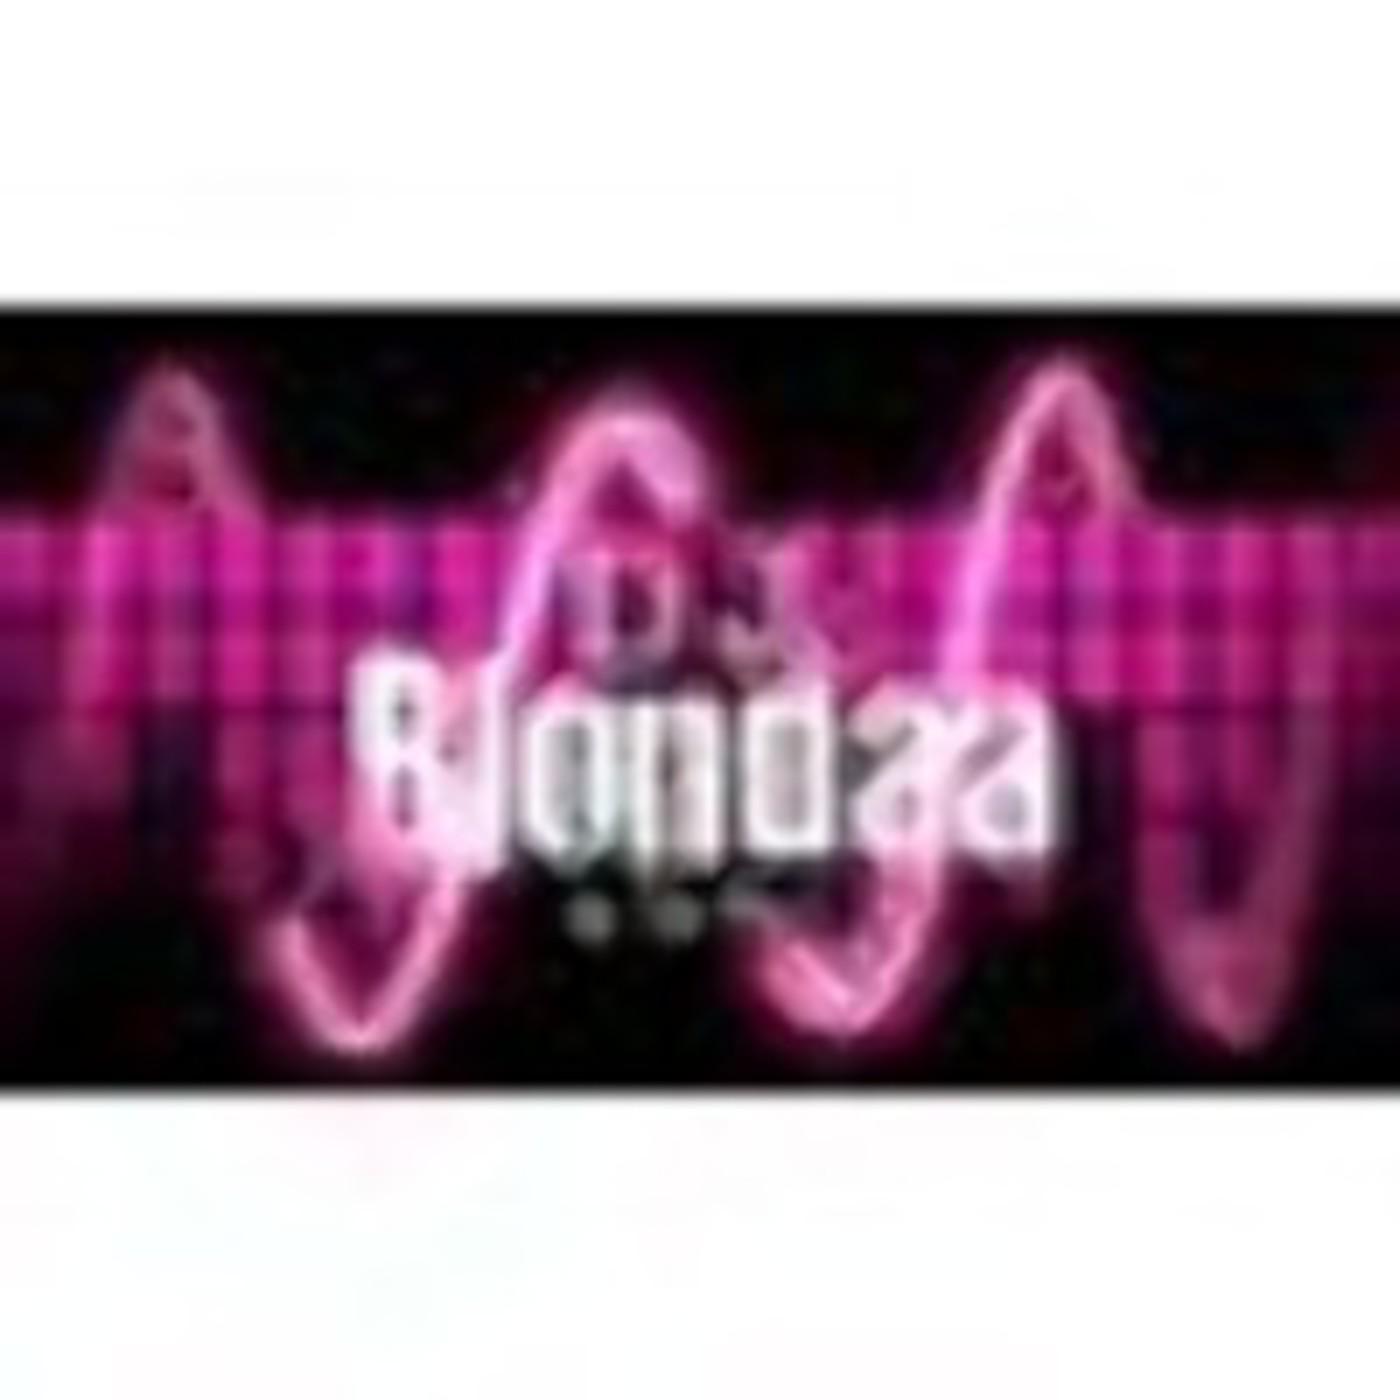 DJ Blondaa